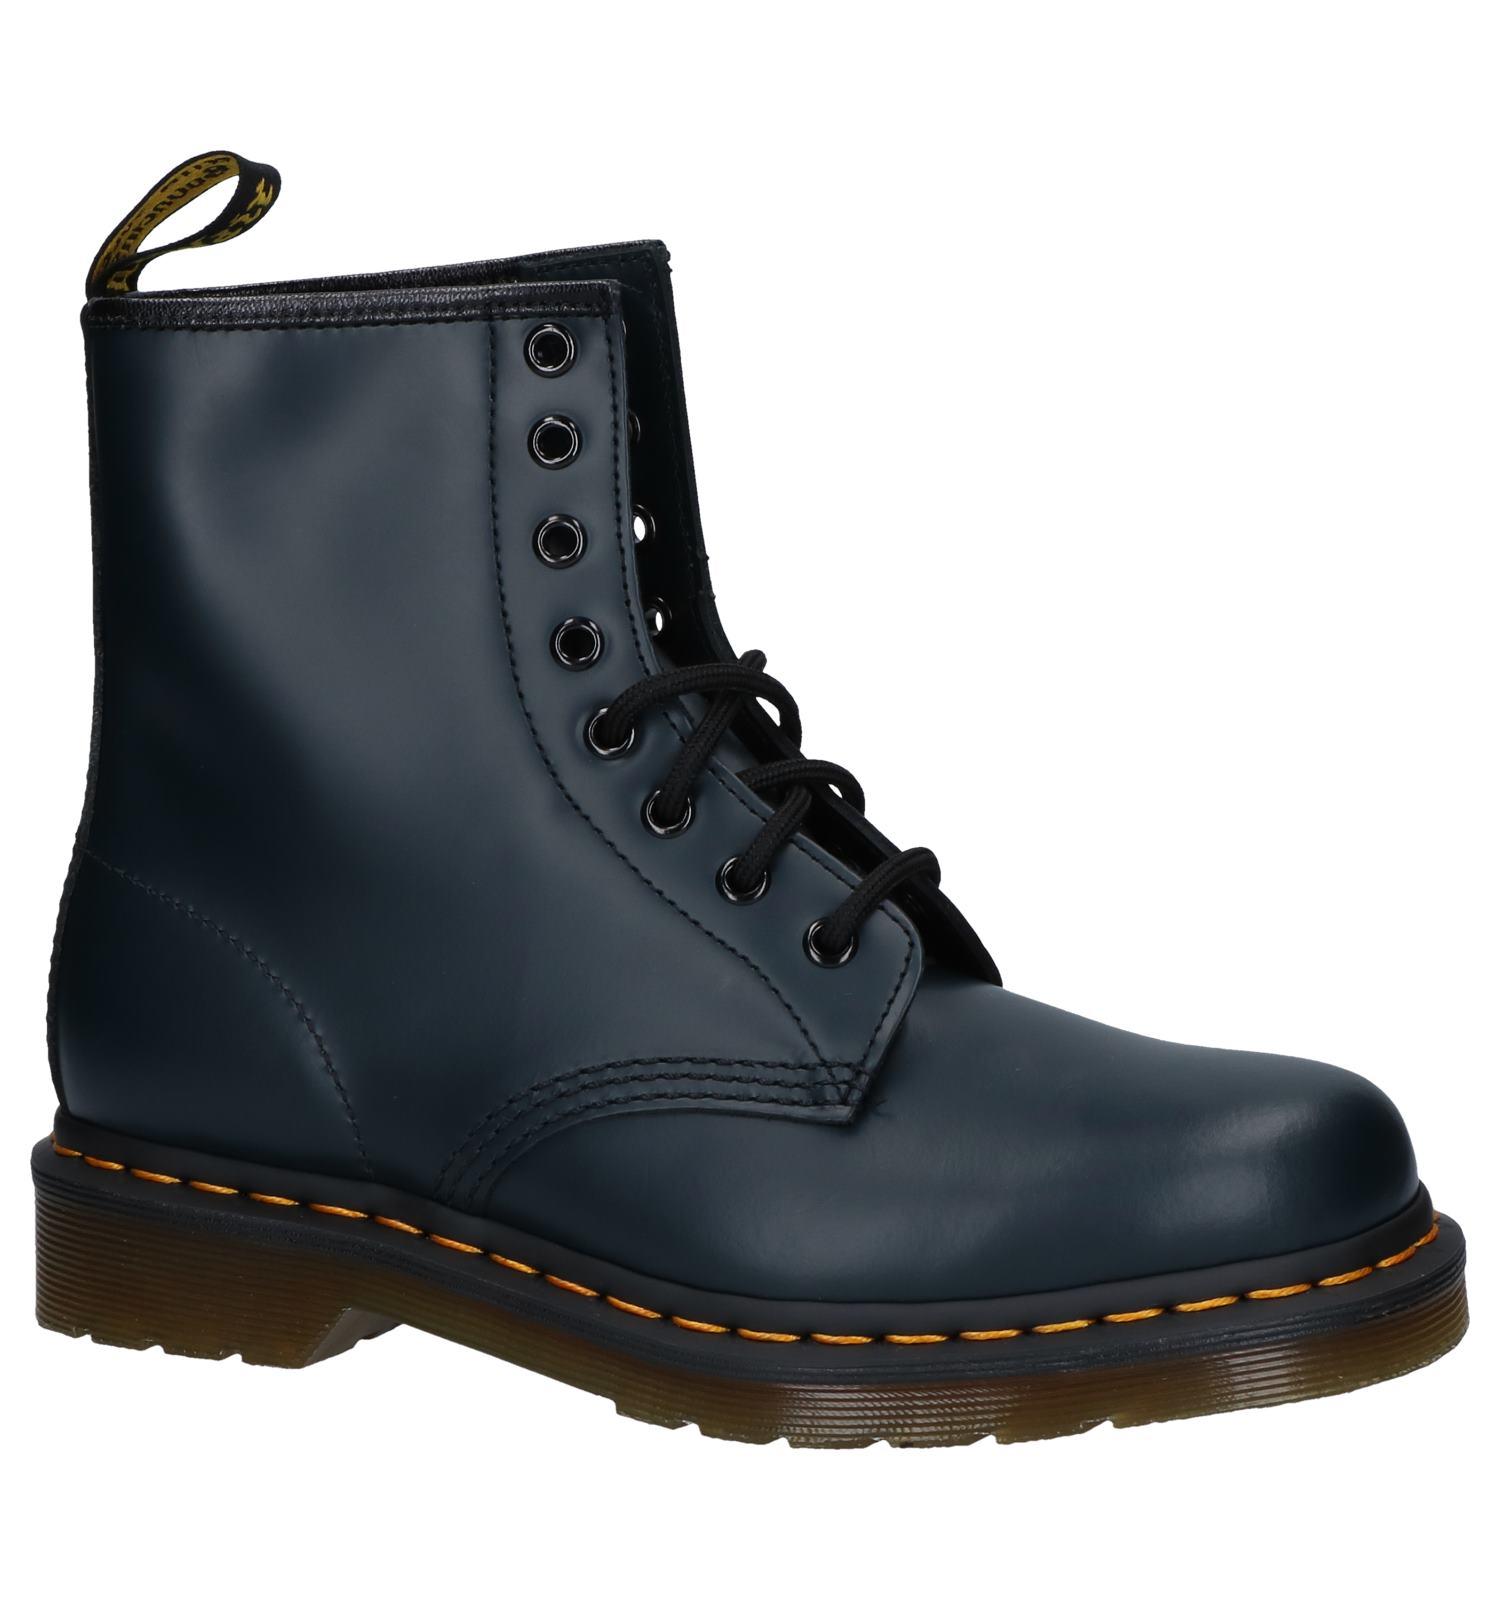 new cheap exclusive range new styles Blauwe Dr. Martens Boots | TORFS.BE | Gratis verzend en retour